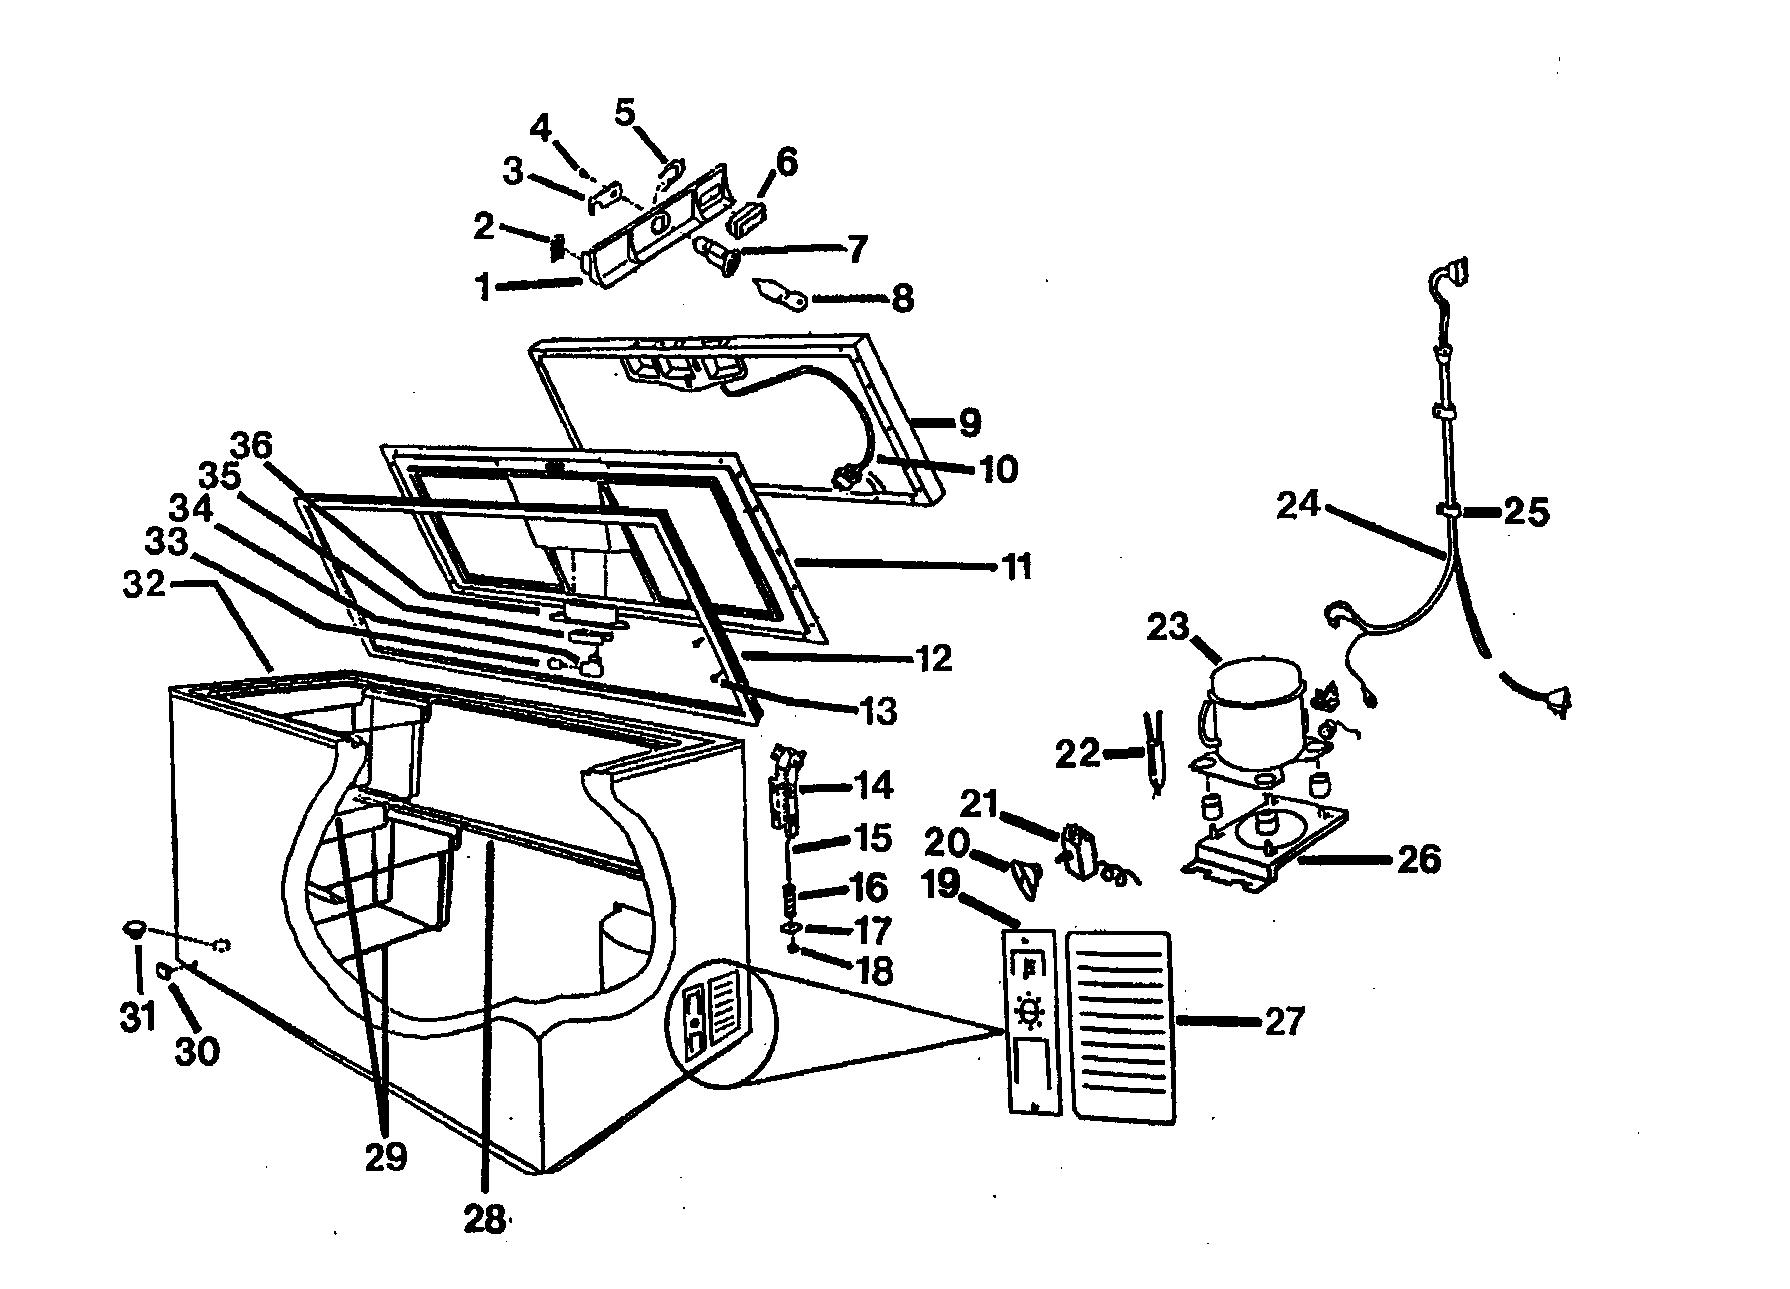 Wc-Wood model C10NAA chest freezer genuine parts